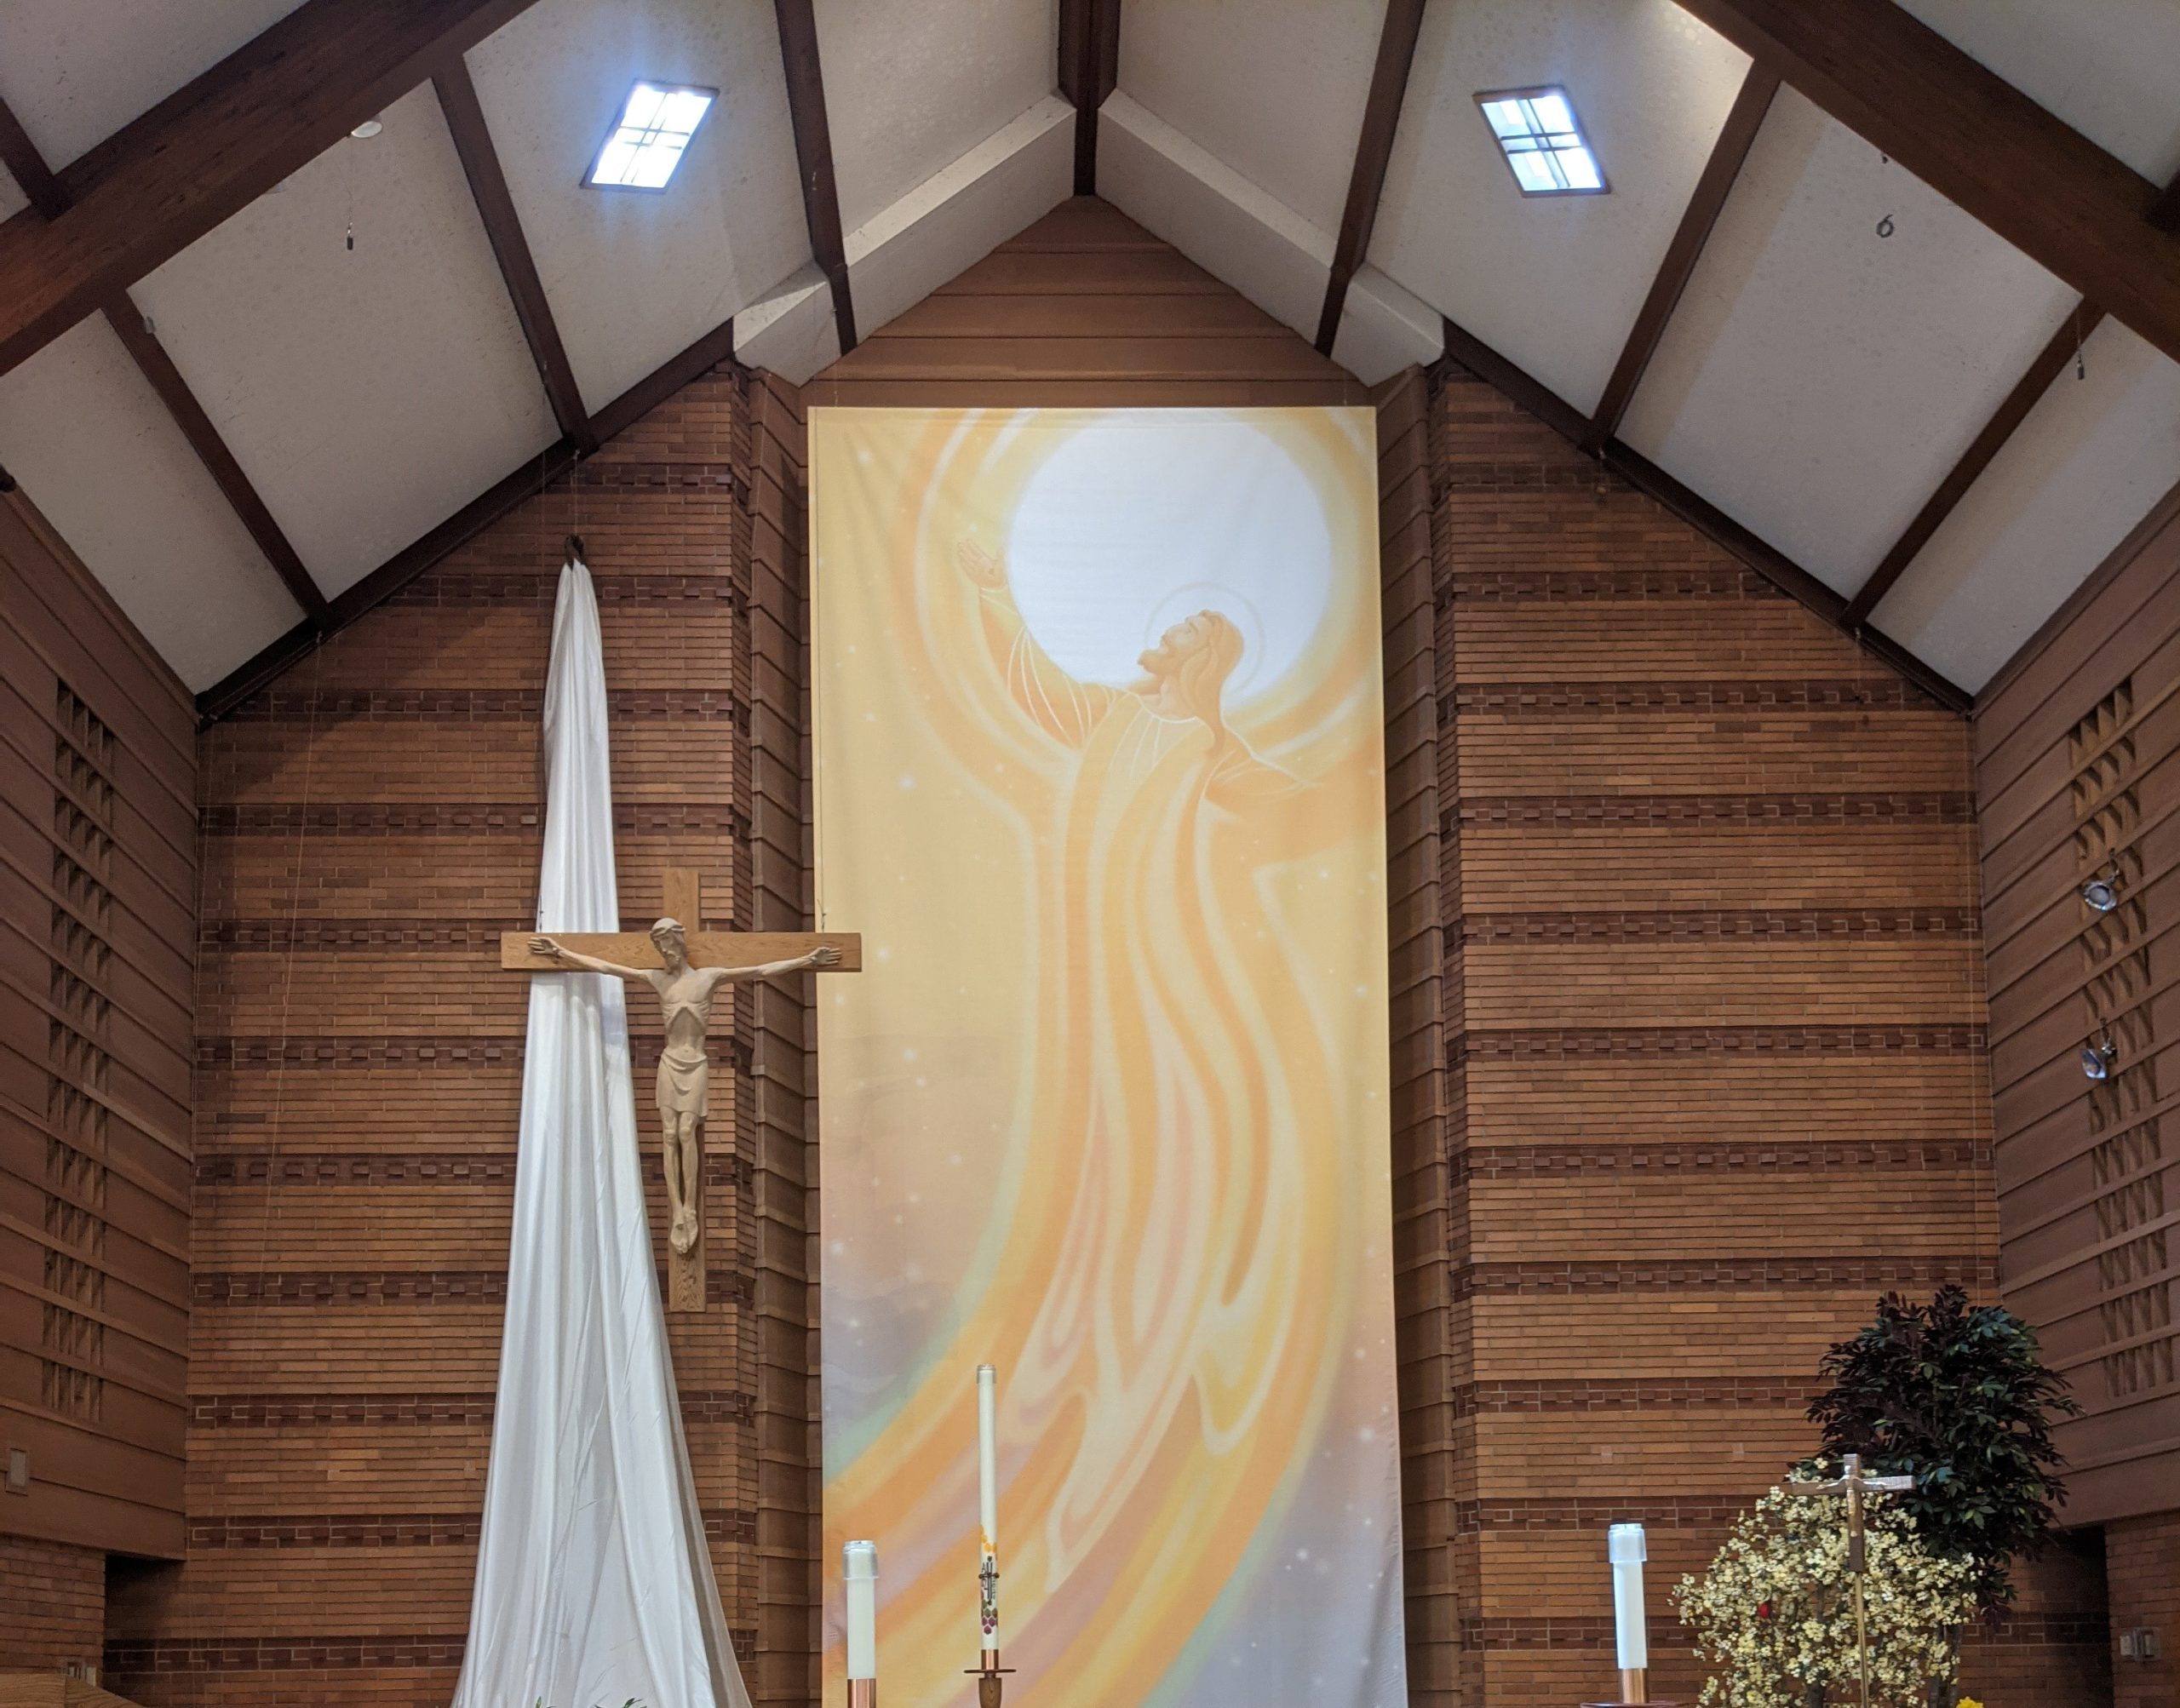 St Raymond Parish, 301 S. I-Oka Ave., Mt Prospect IL 60056